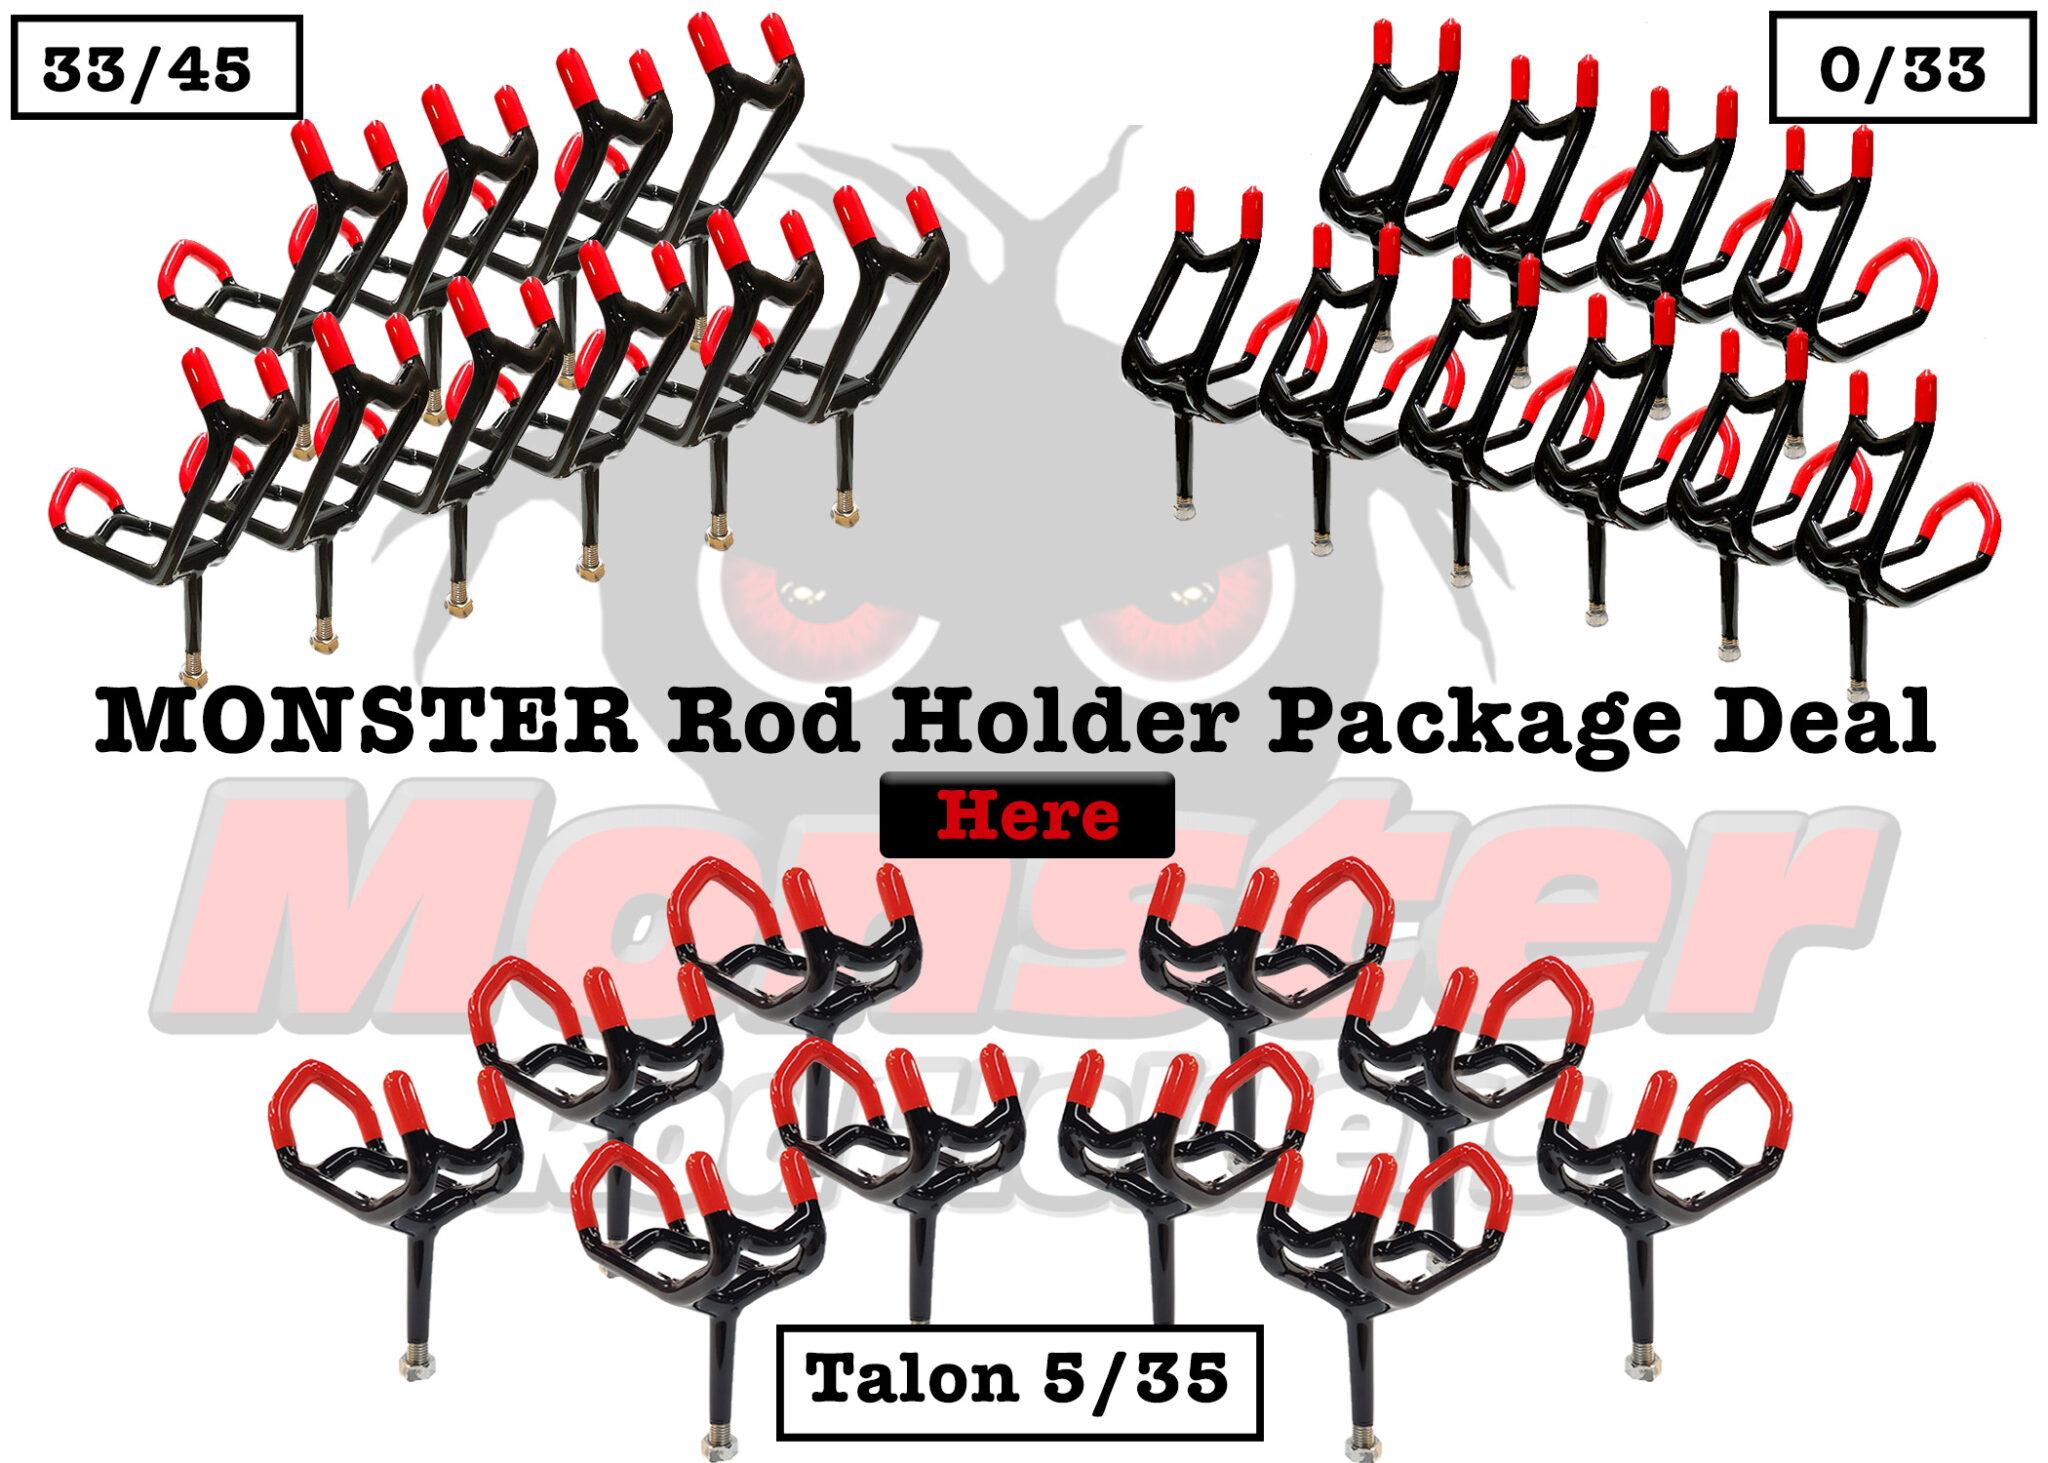 Monster Rod Holder Package Deal